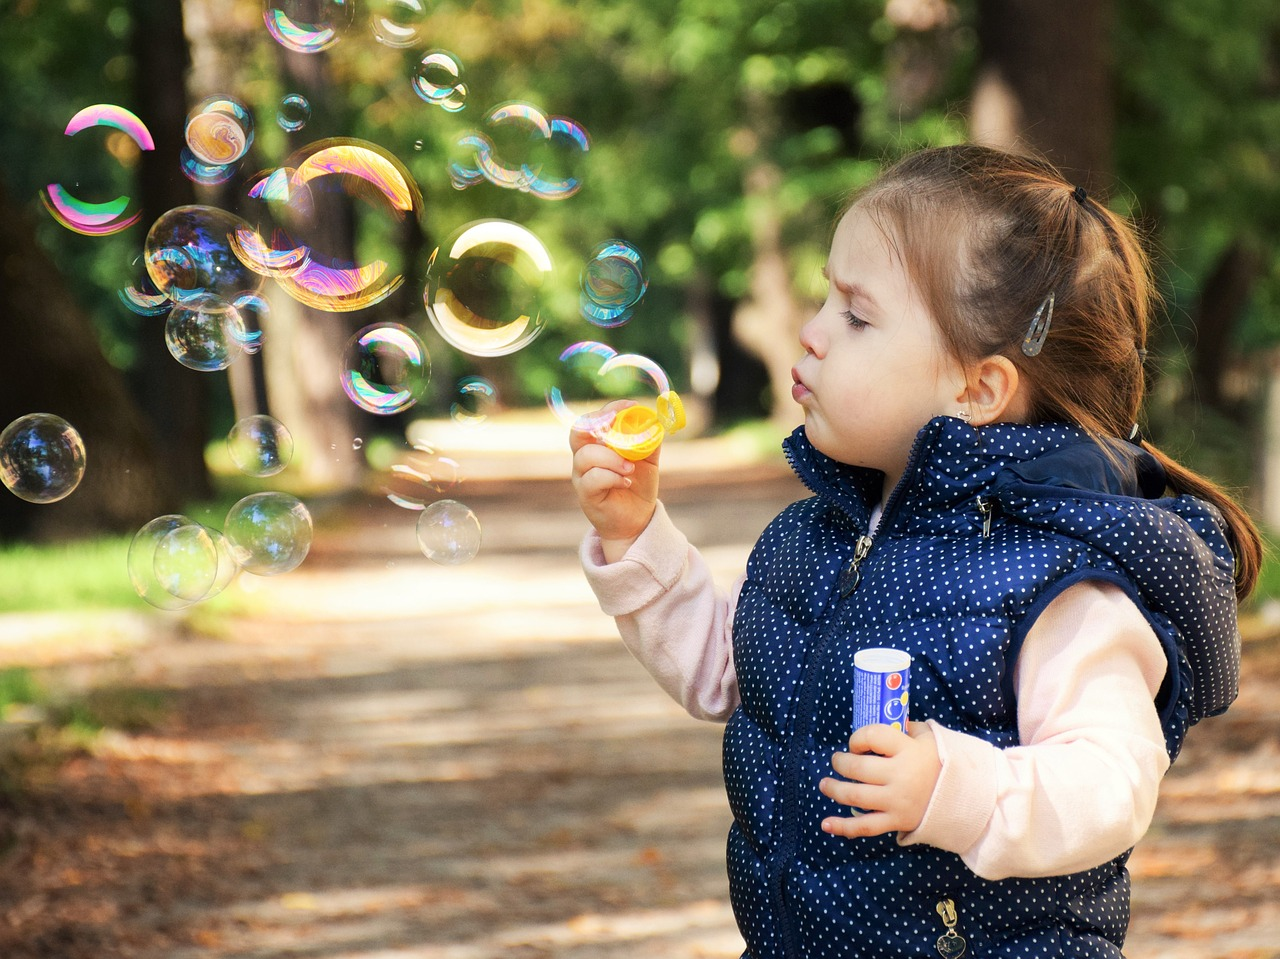 child custody mediation divorce without a lawyer